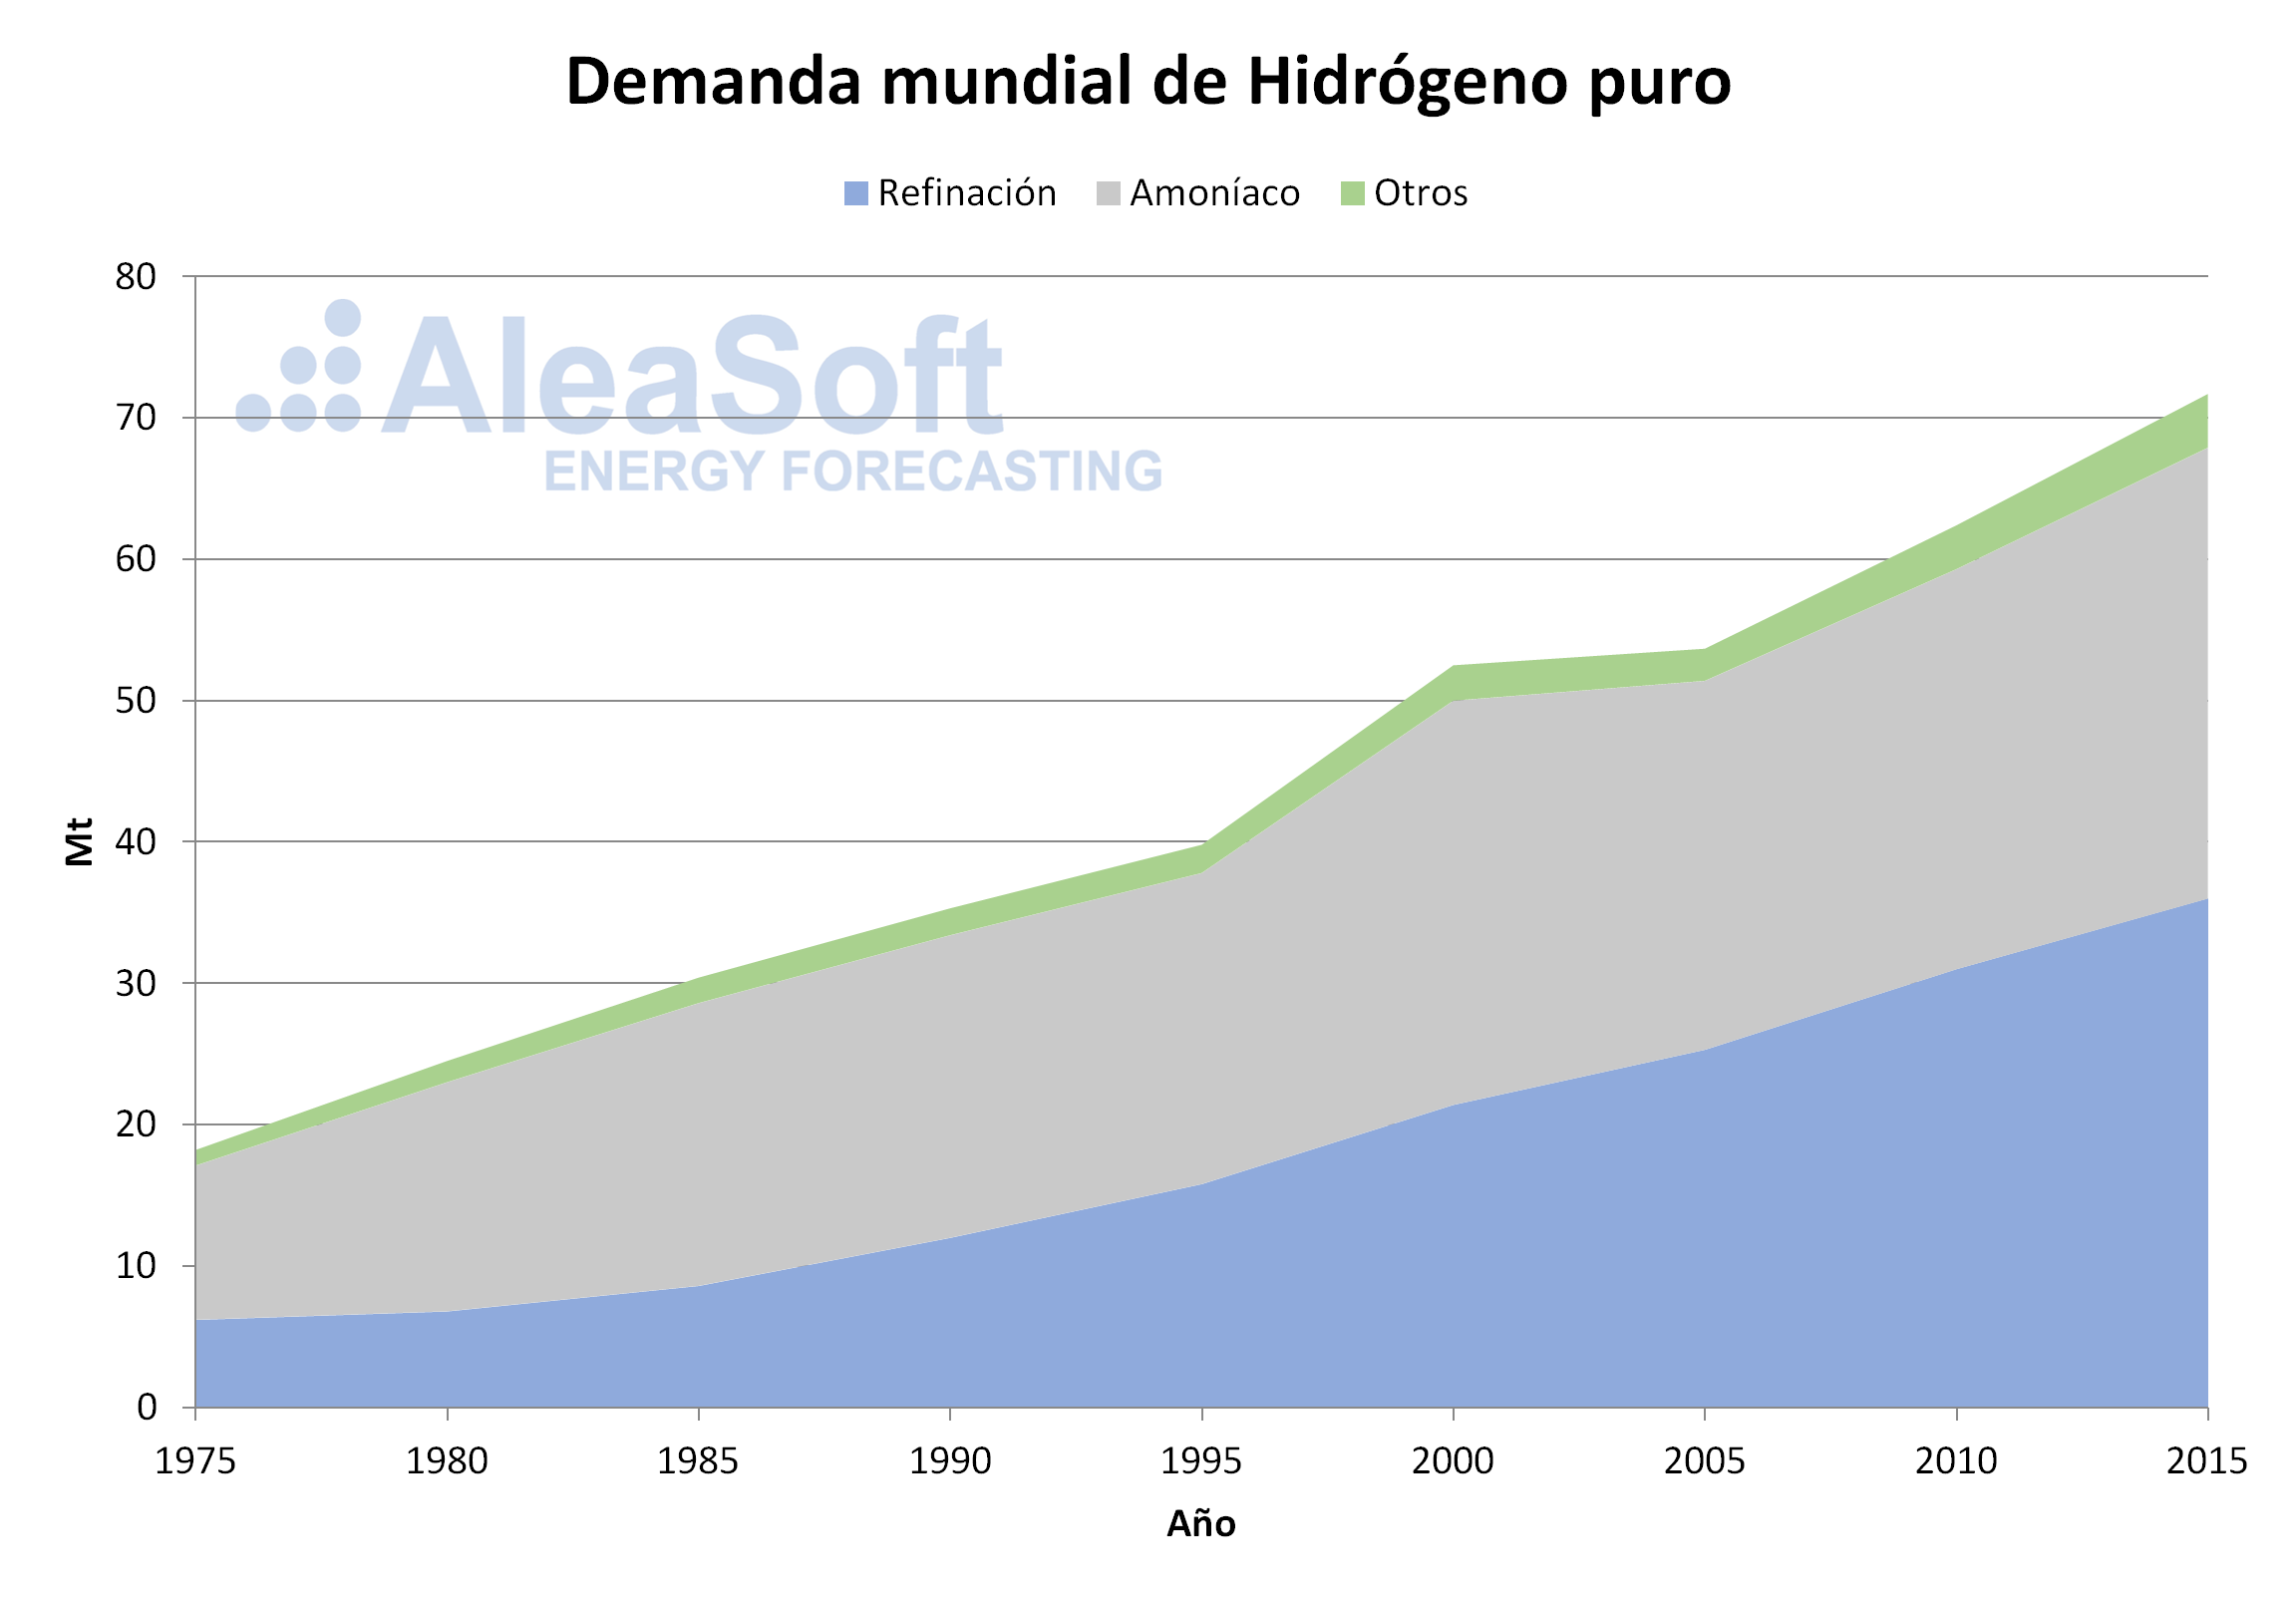 AleaSoft - demanda mundial hidrogeno puro